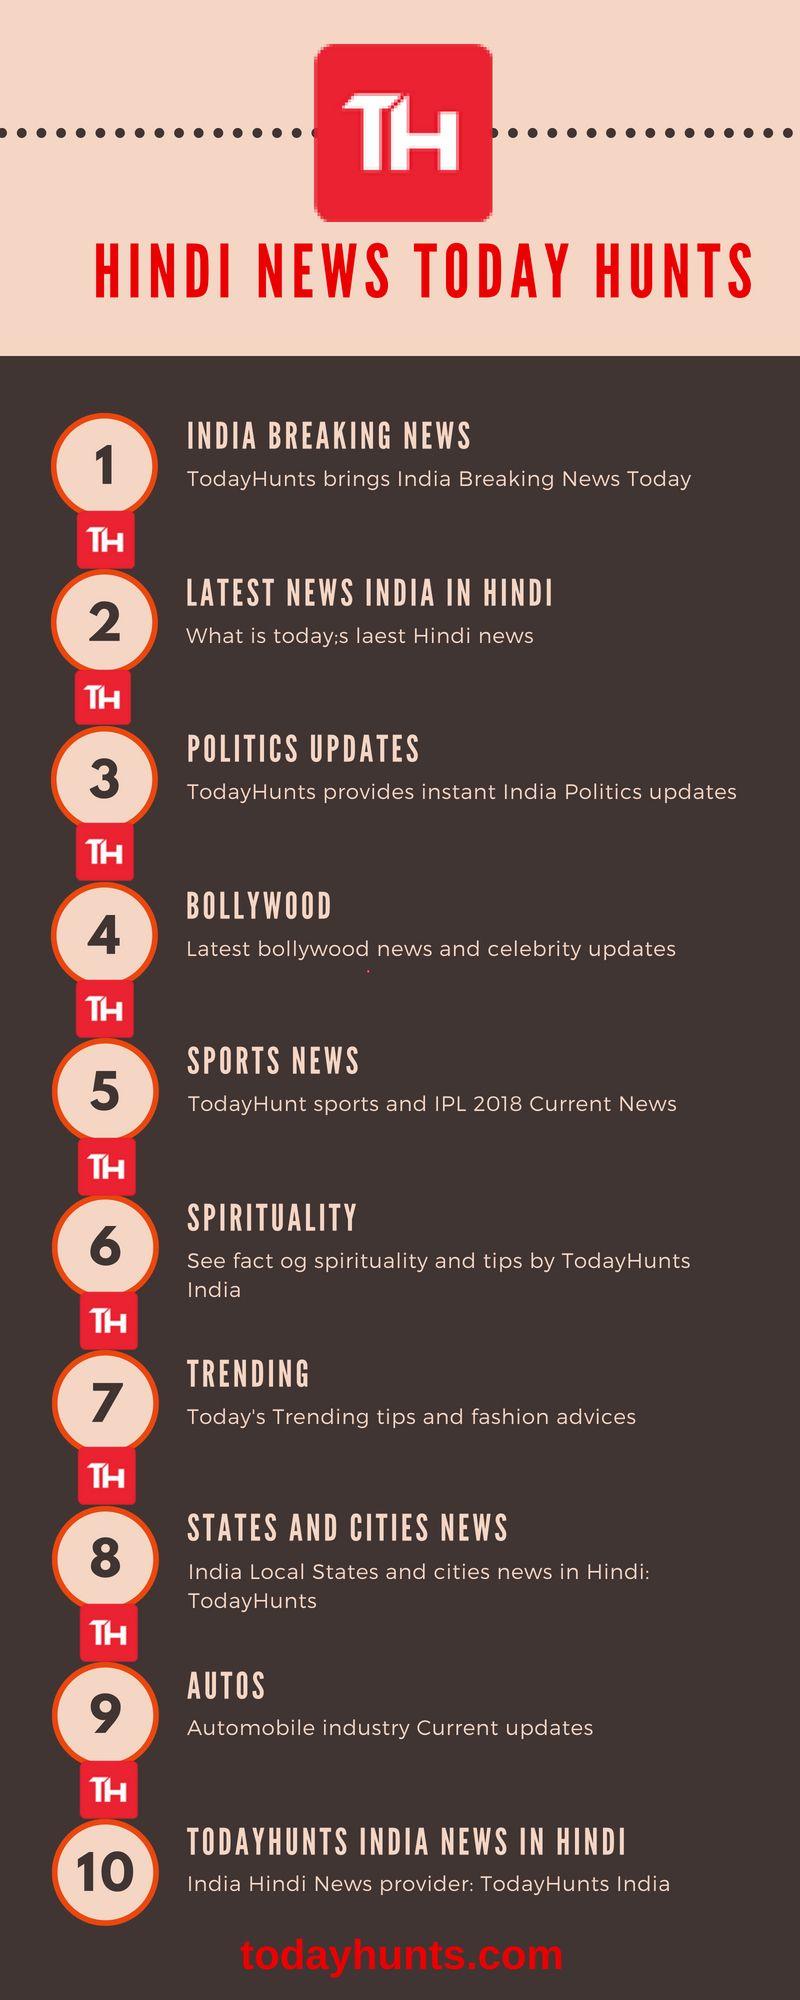 Todayhunts India Latest news provider in Hindi, English